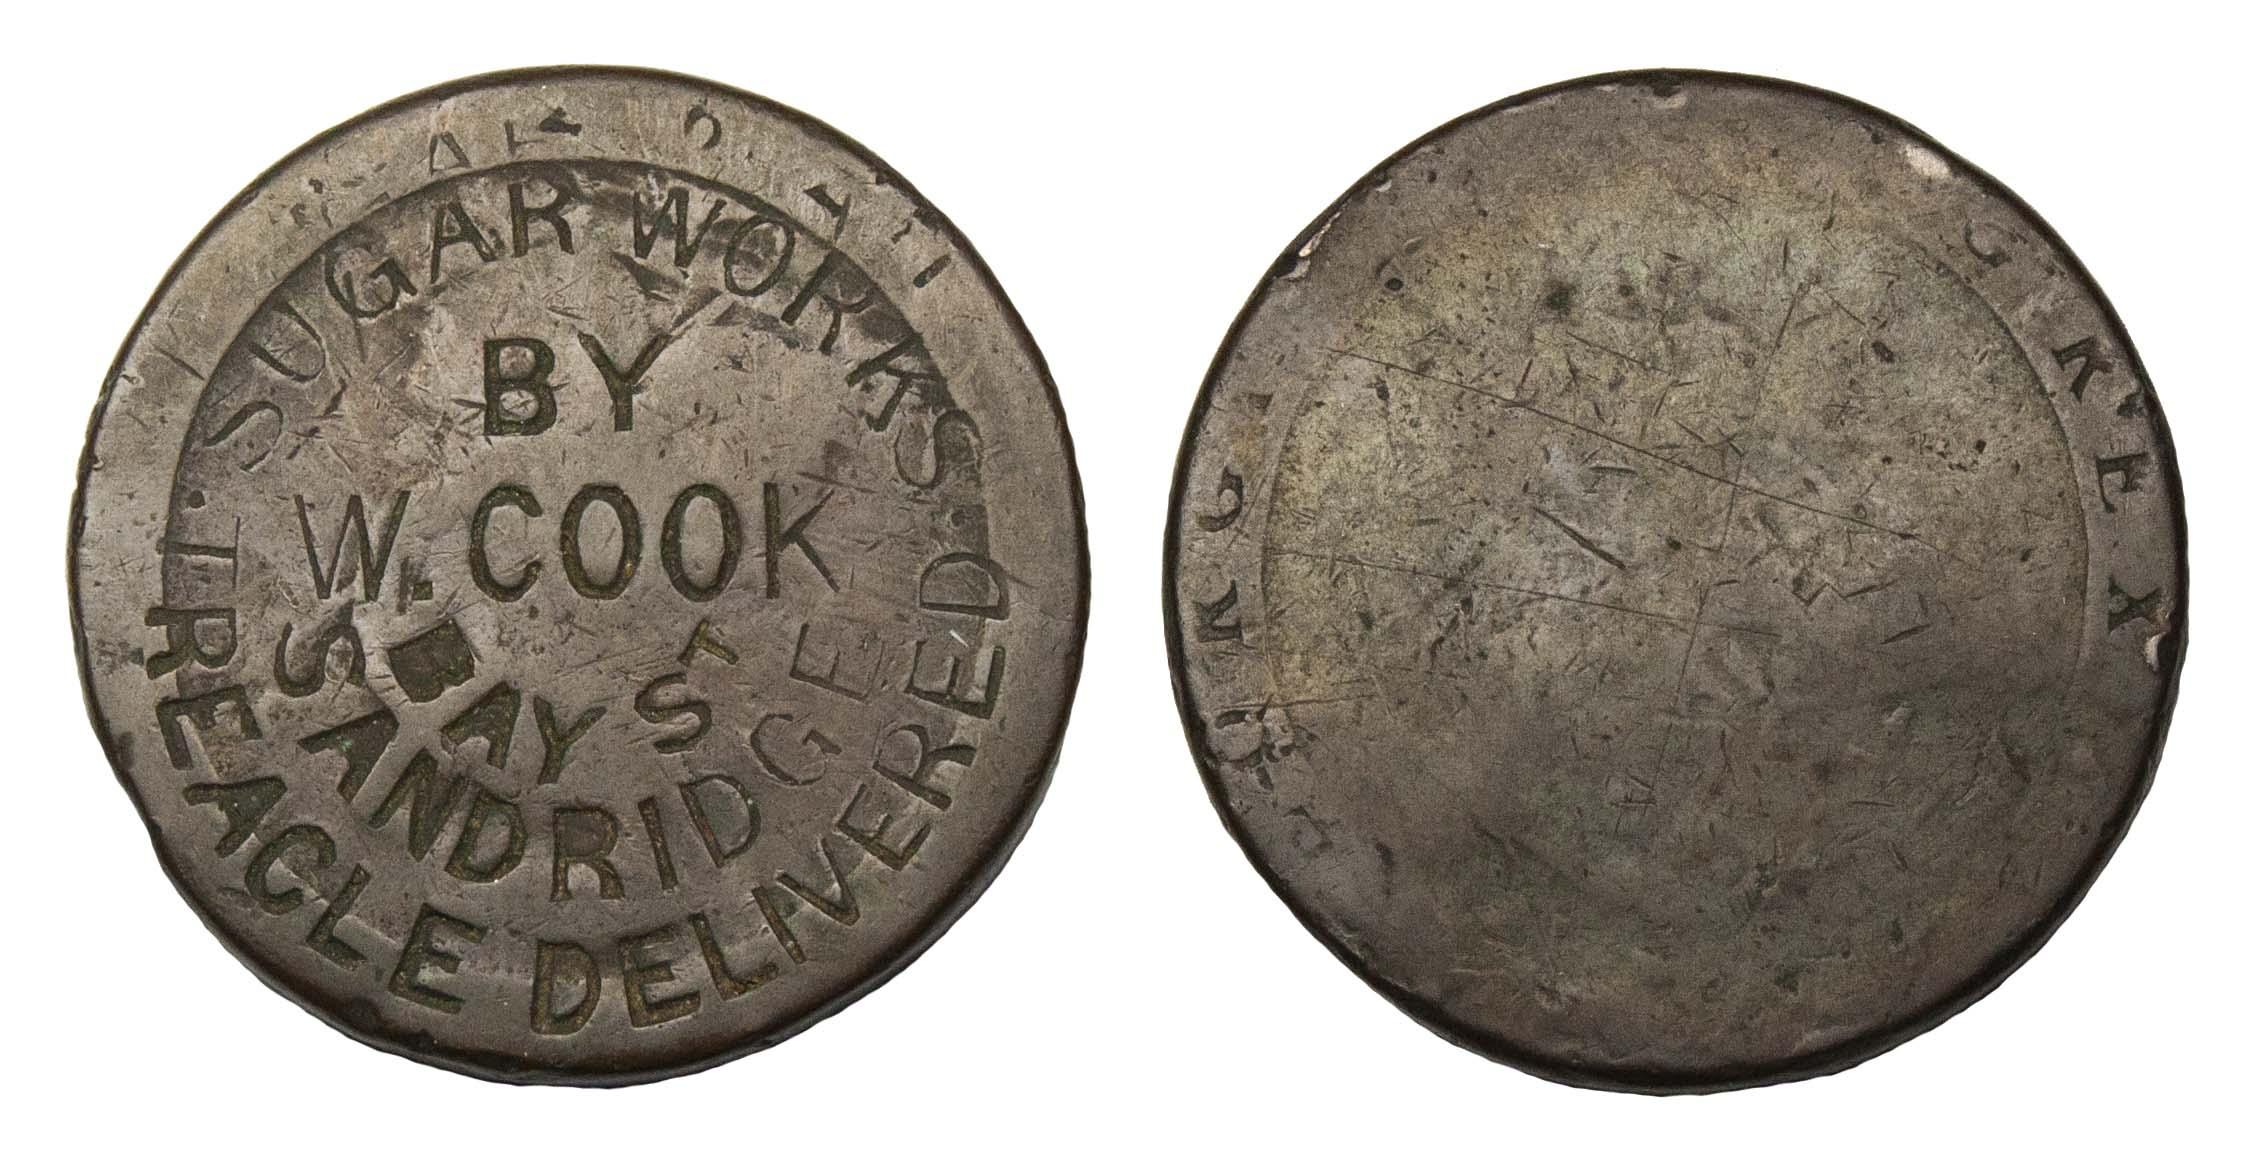 Australia, W.C. Cook, Copper Penny Token